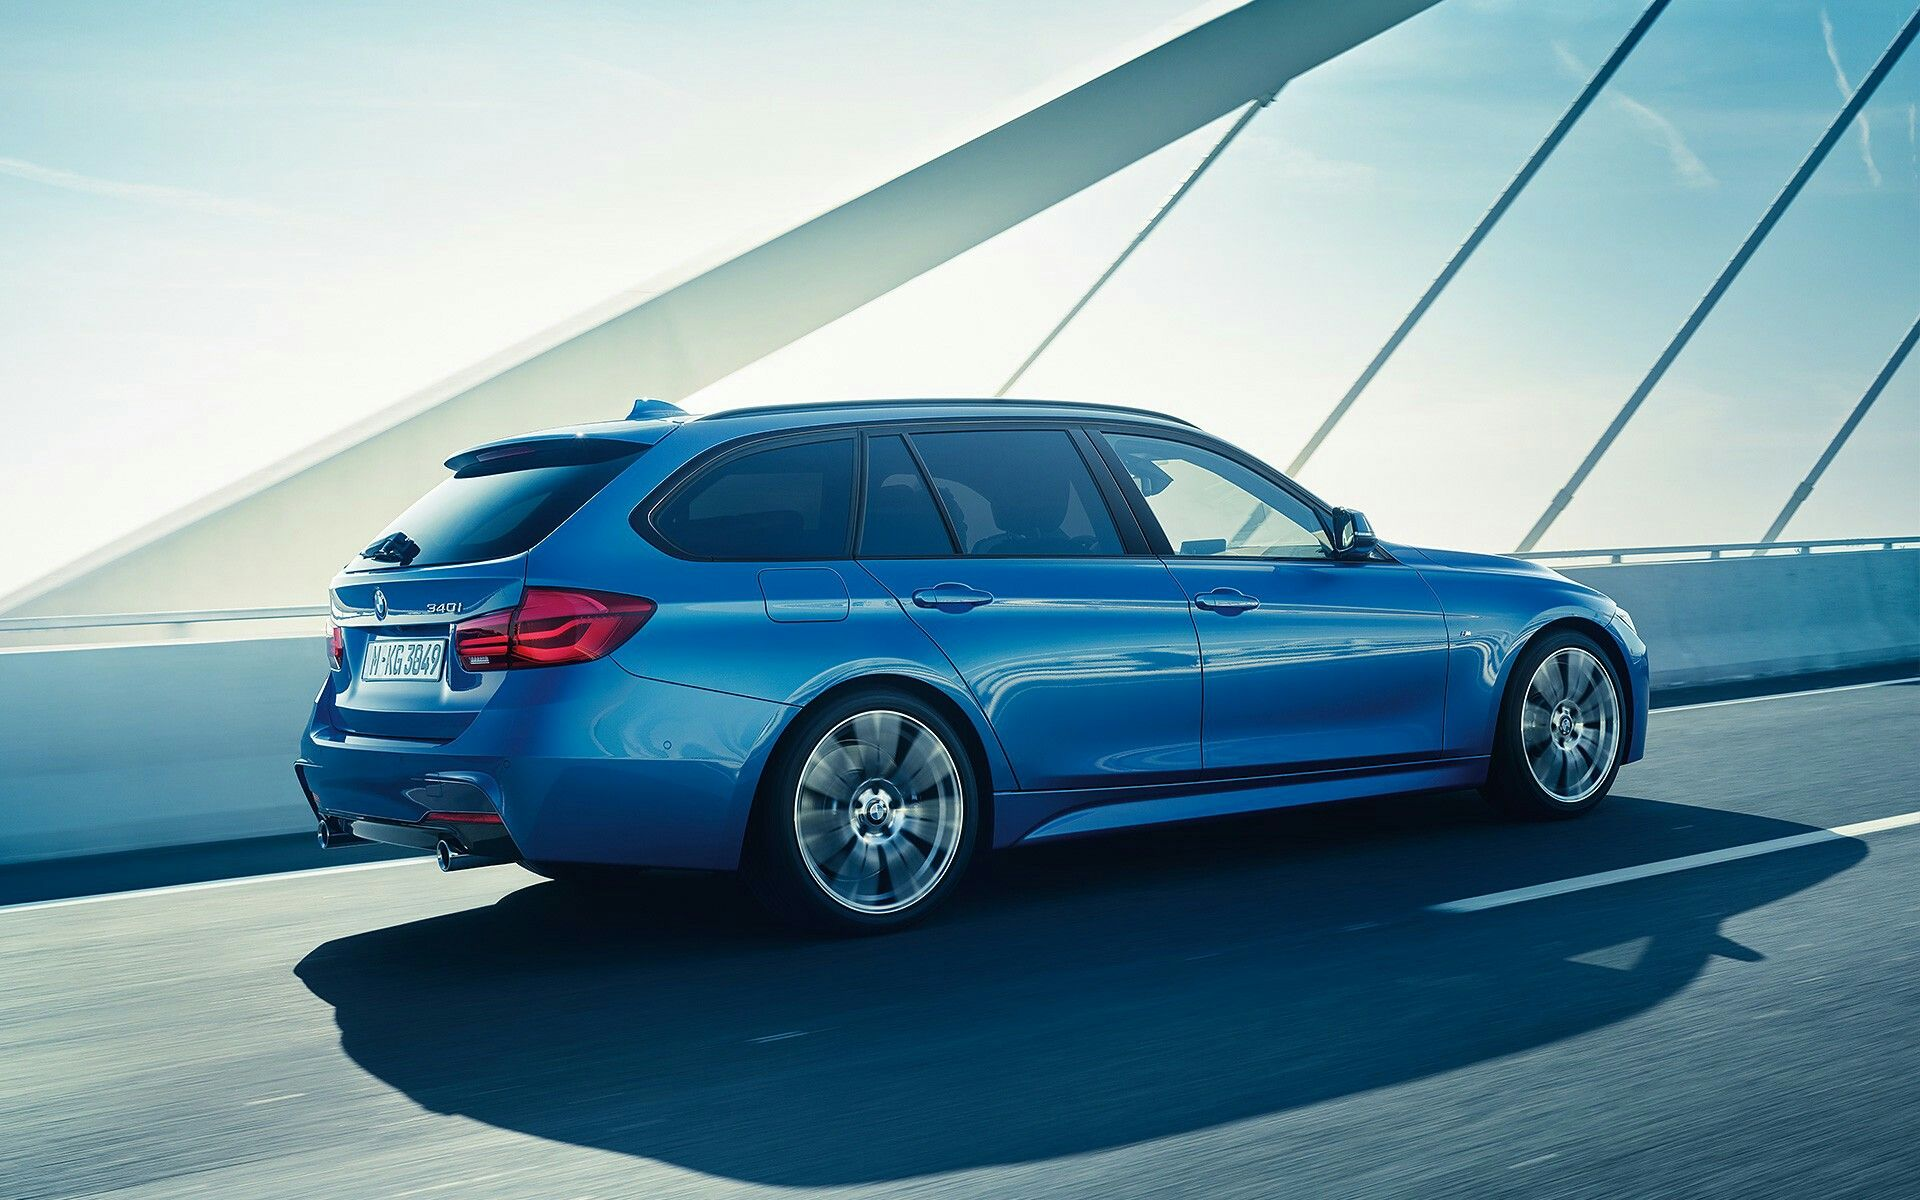 BMW F31 Touring M-Paket Estorilblau